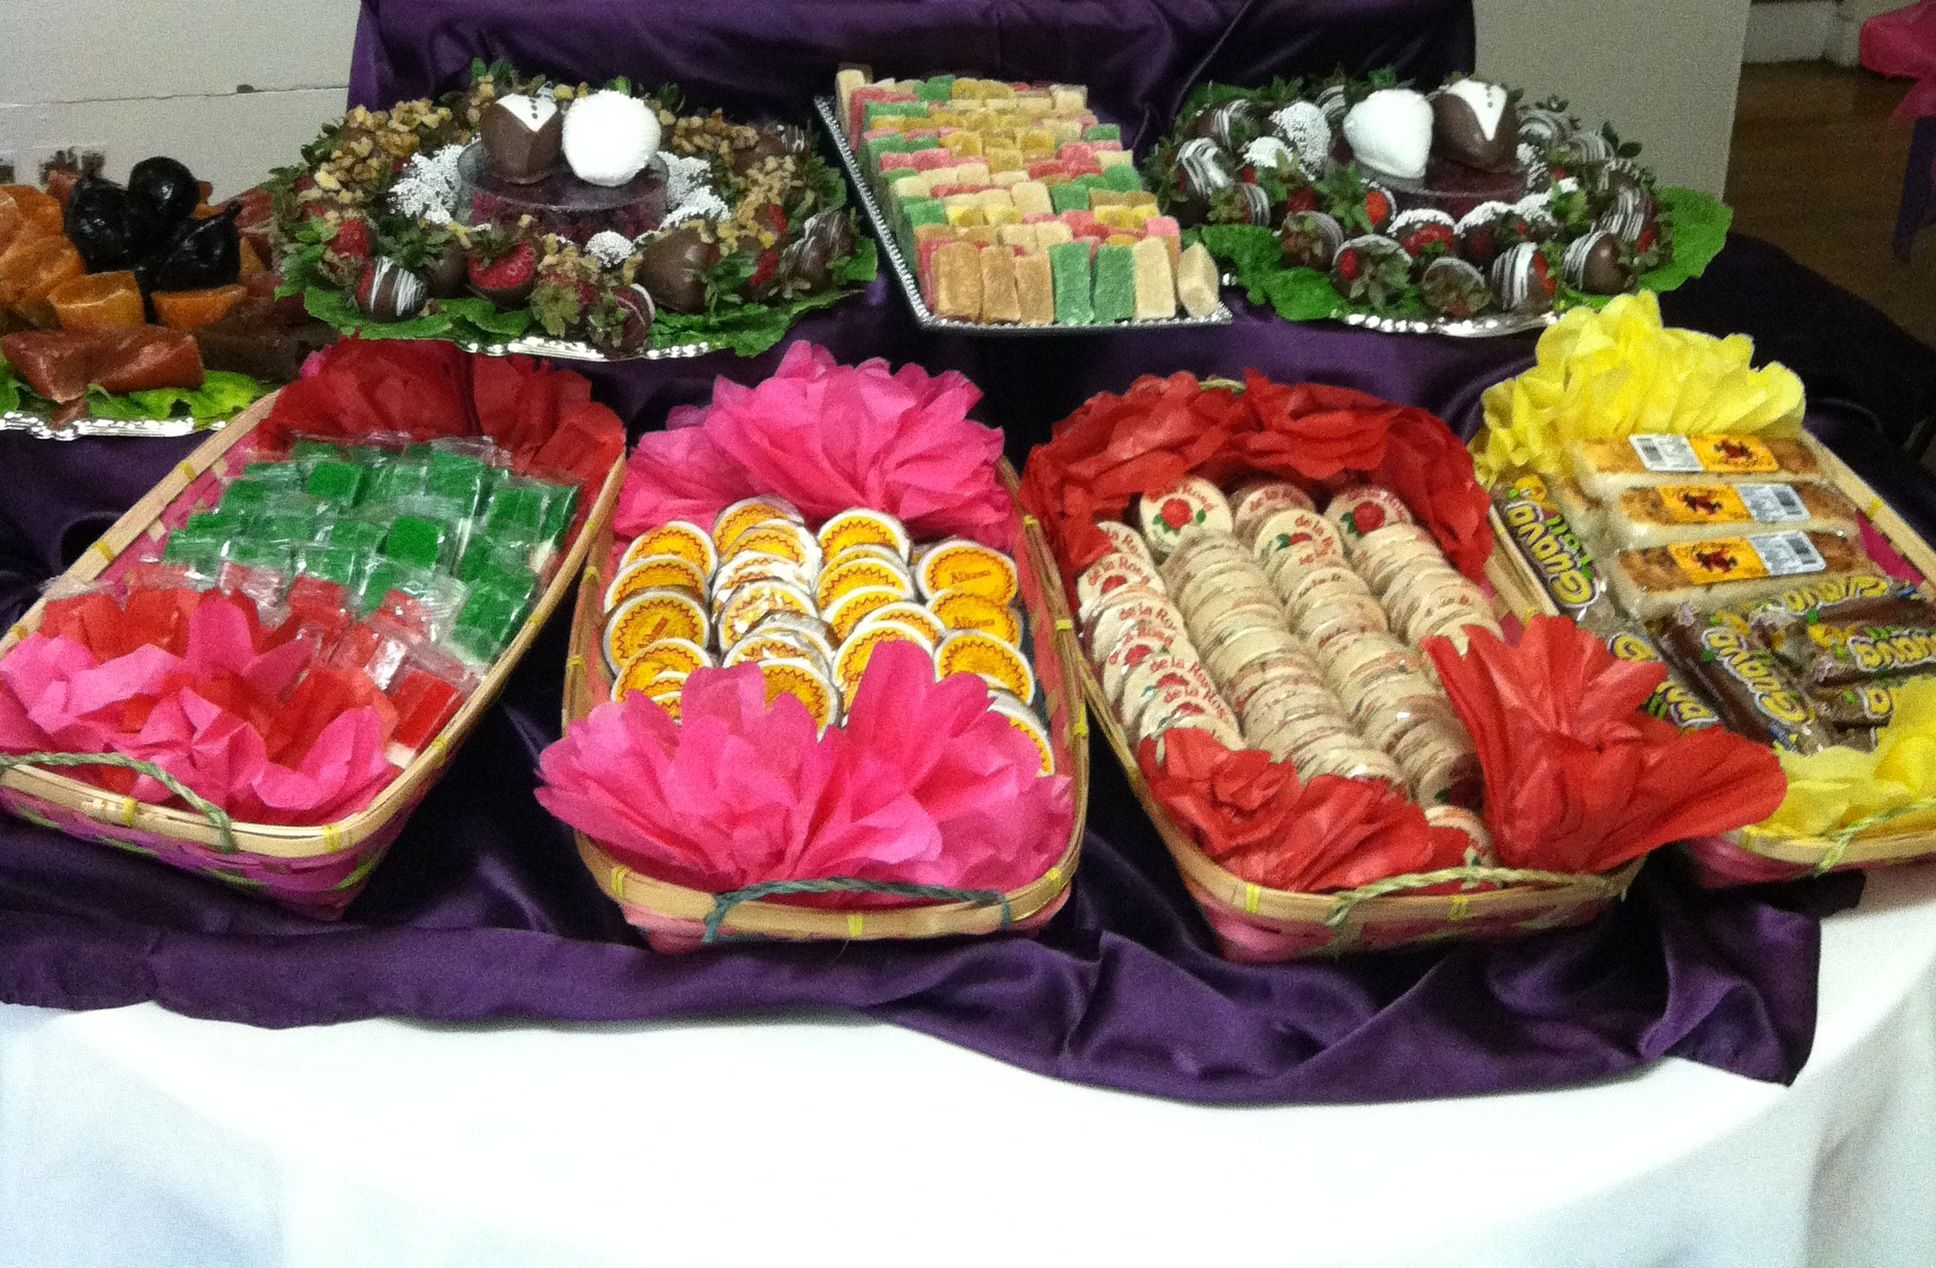 Fiesta table decorations ideas - Birthdays